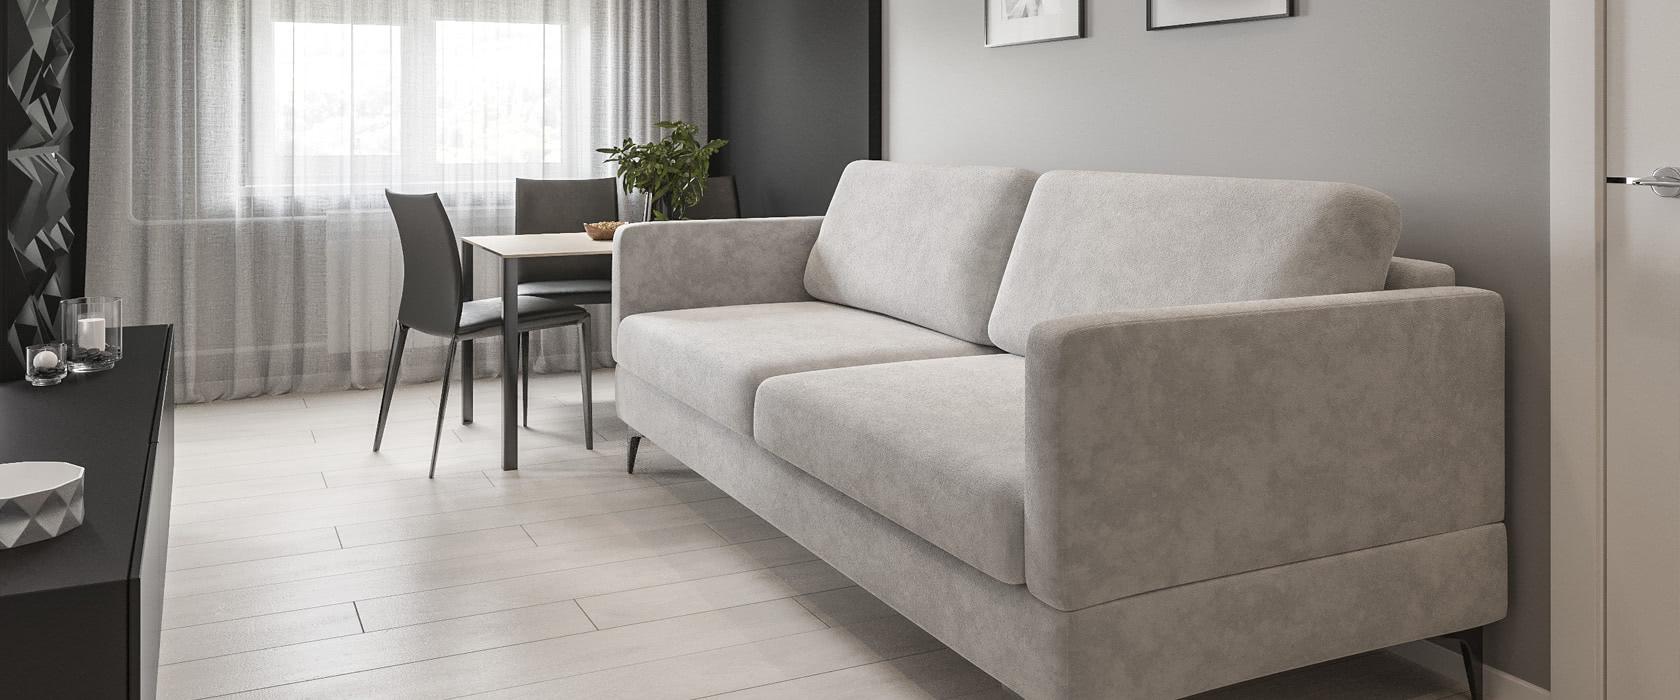 Тримісний диван Bruno Club - Фото 2 - Pufetto